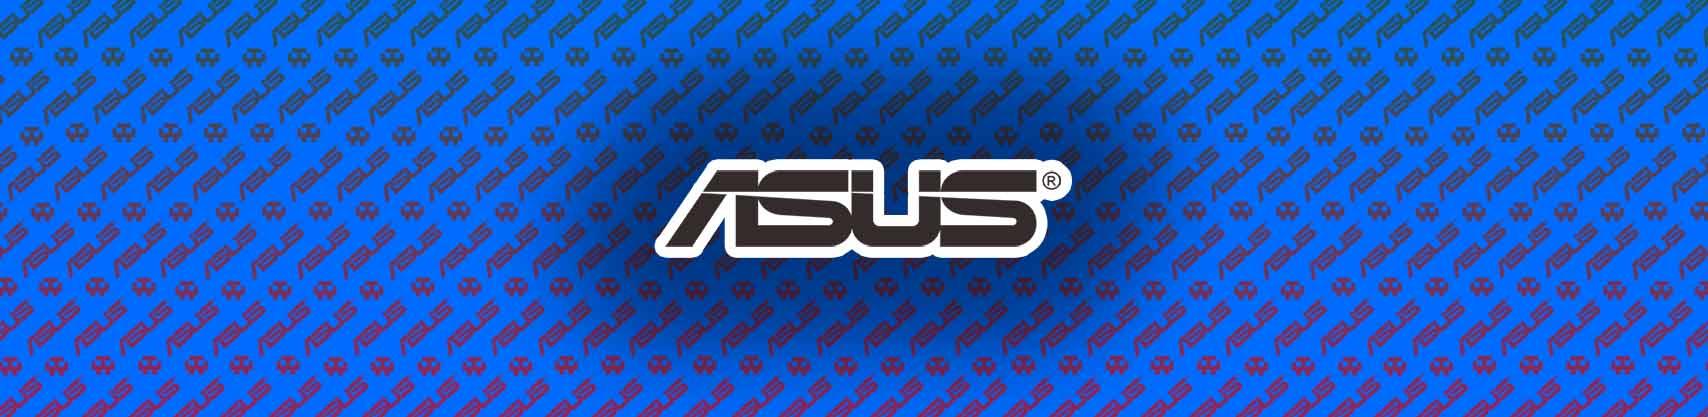 Asus X99 Deluxe Manual